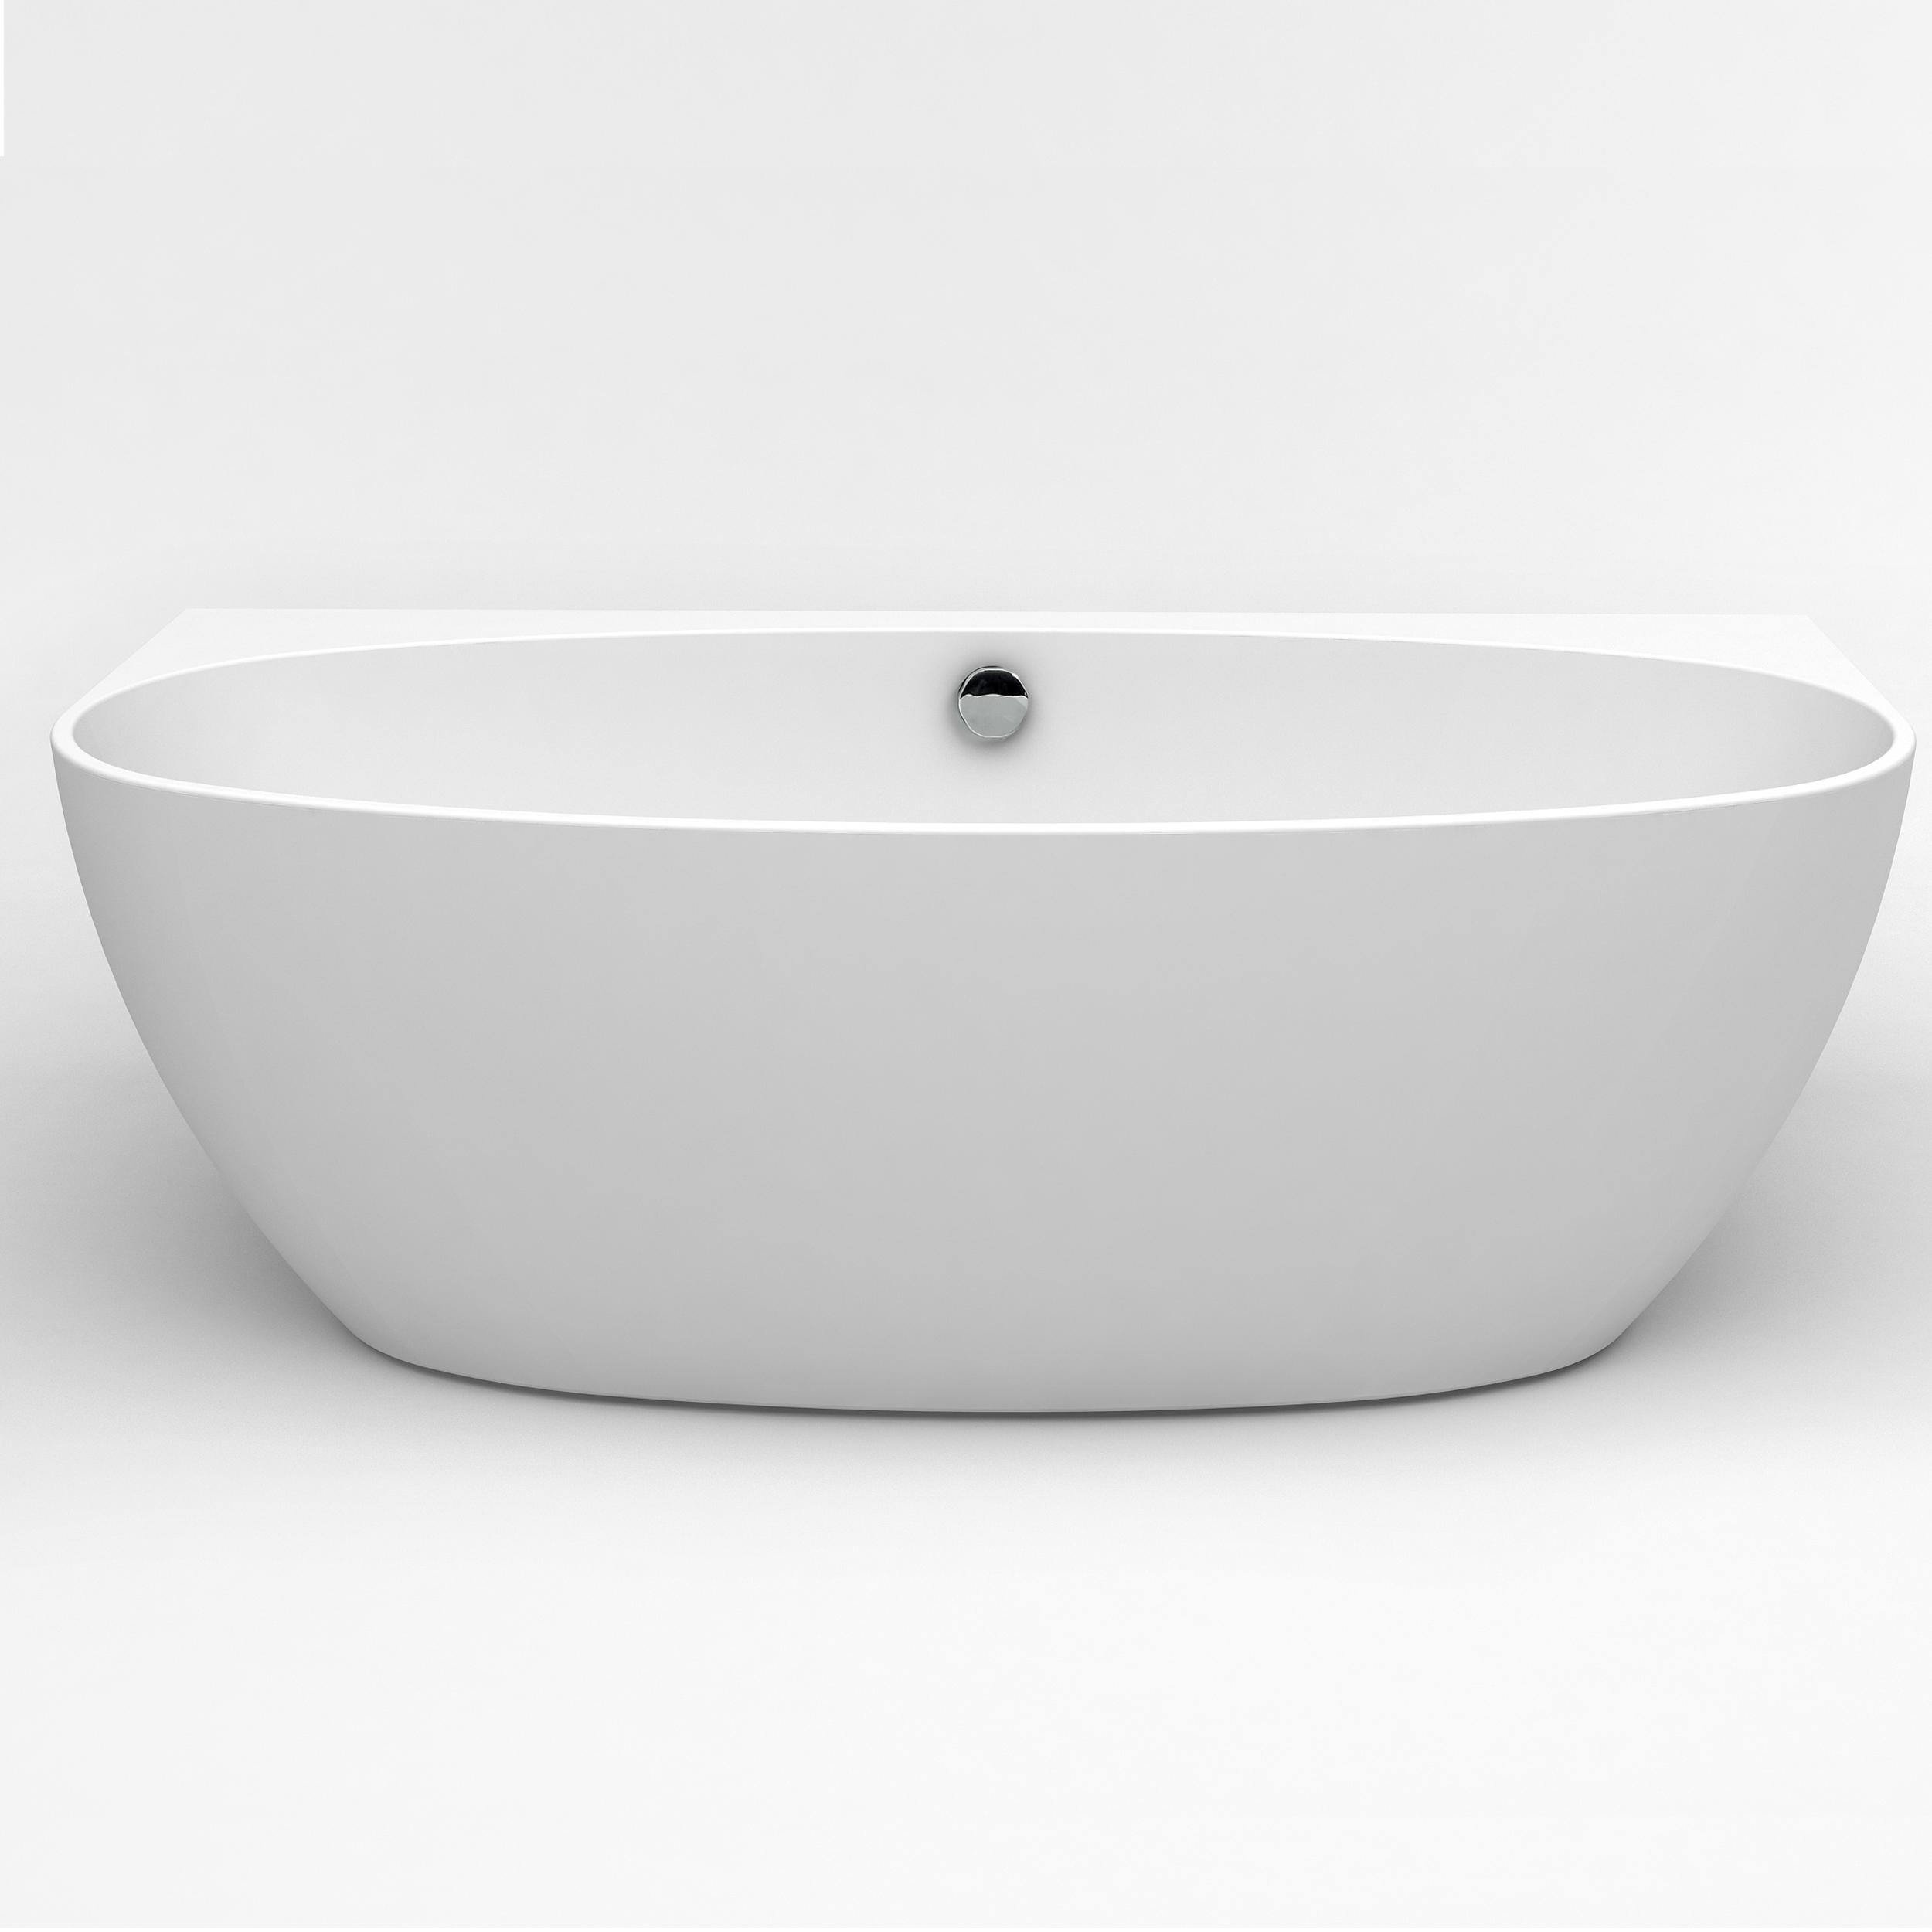 "EVTB1065 60WH A Main - Eviva Jasmine 60"" Freestanding White Acrylic Bathtub"